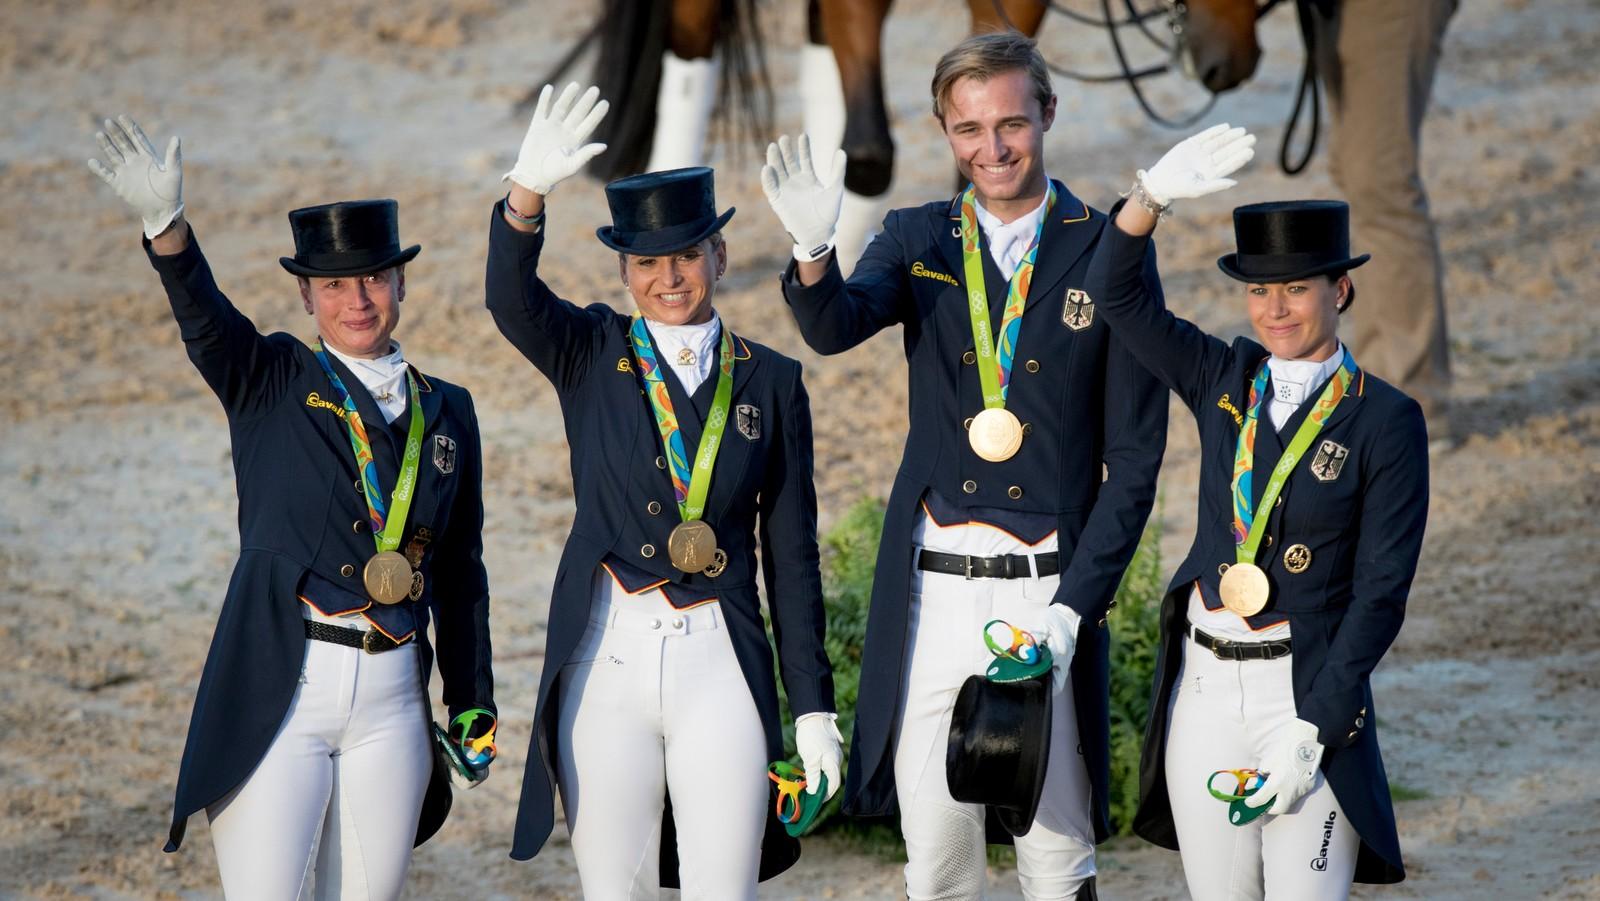 Duitse dressuurploeg pakt Olympisch goud, Nederland roemloos vierde